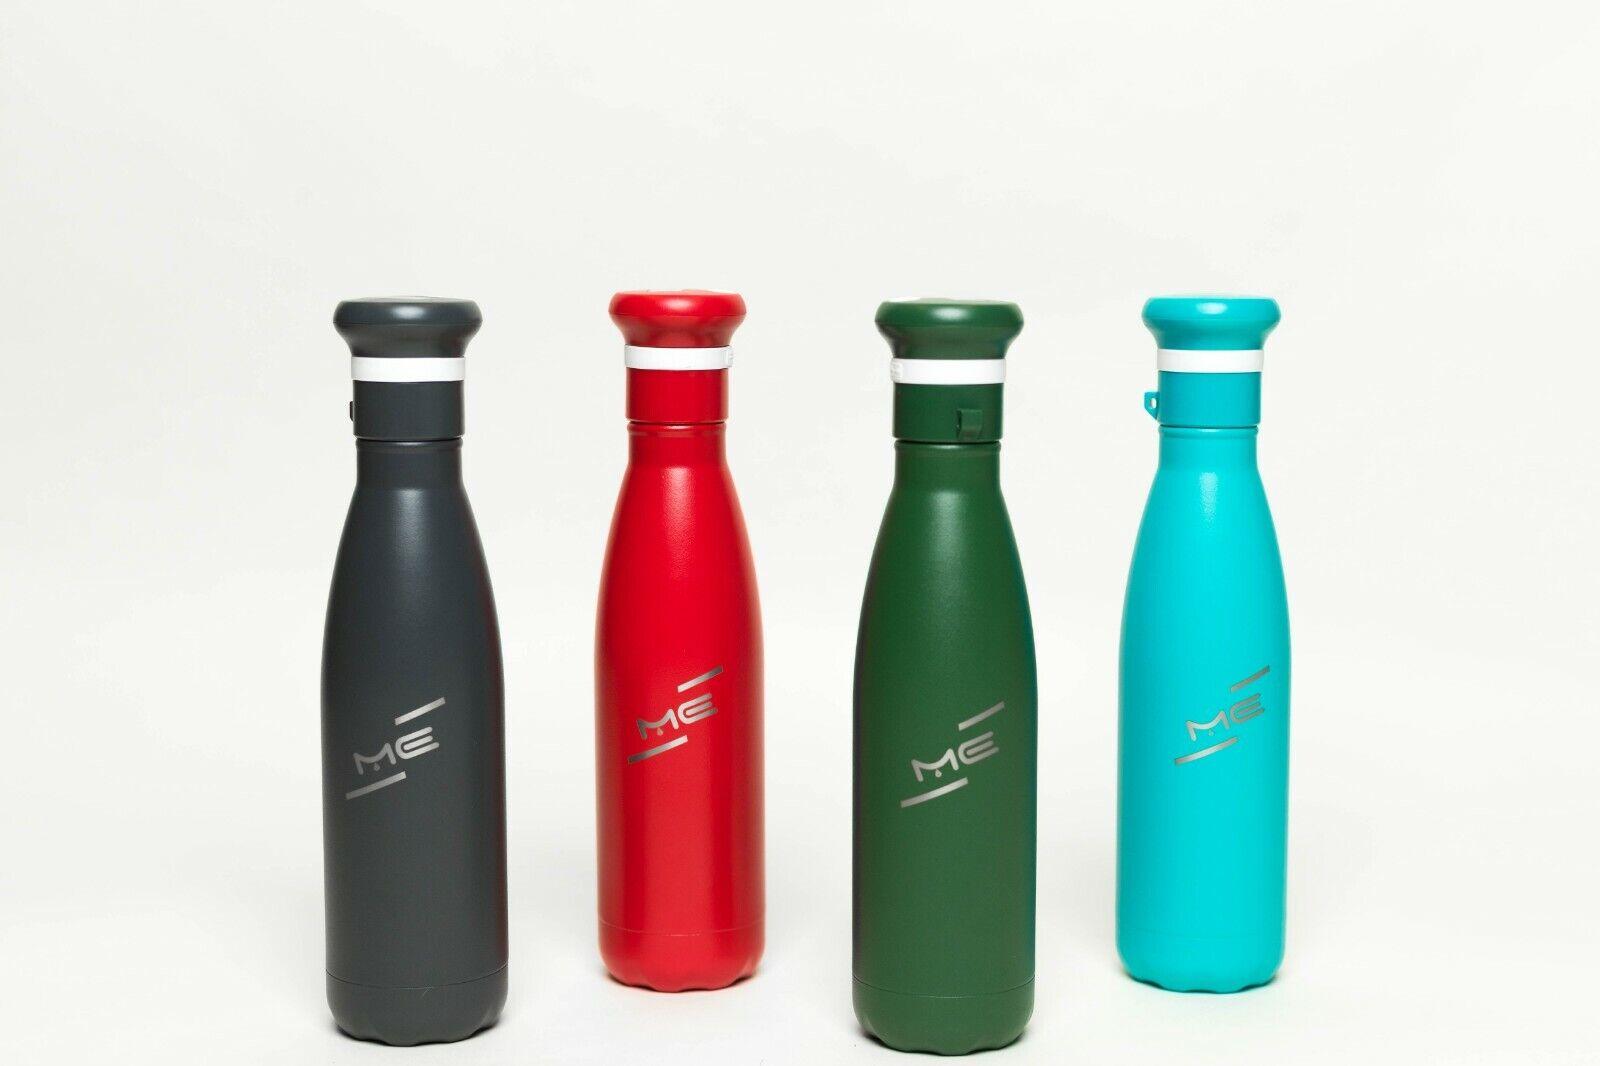 Me Water Bottle UVC LED Cap Water Filtration Sterilization w  Charcoal Filters